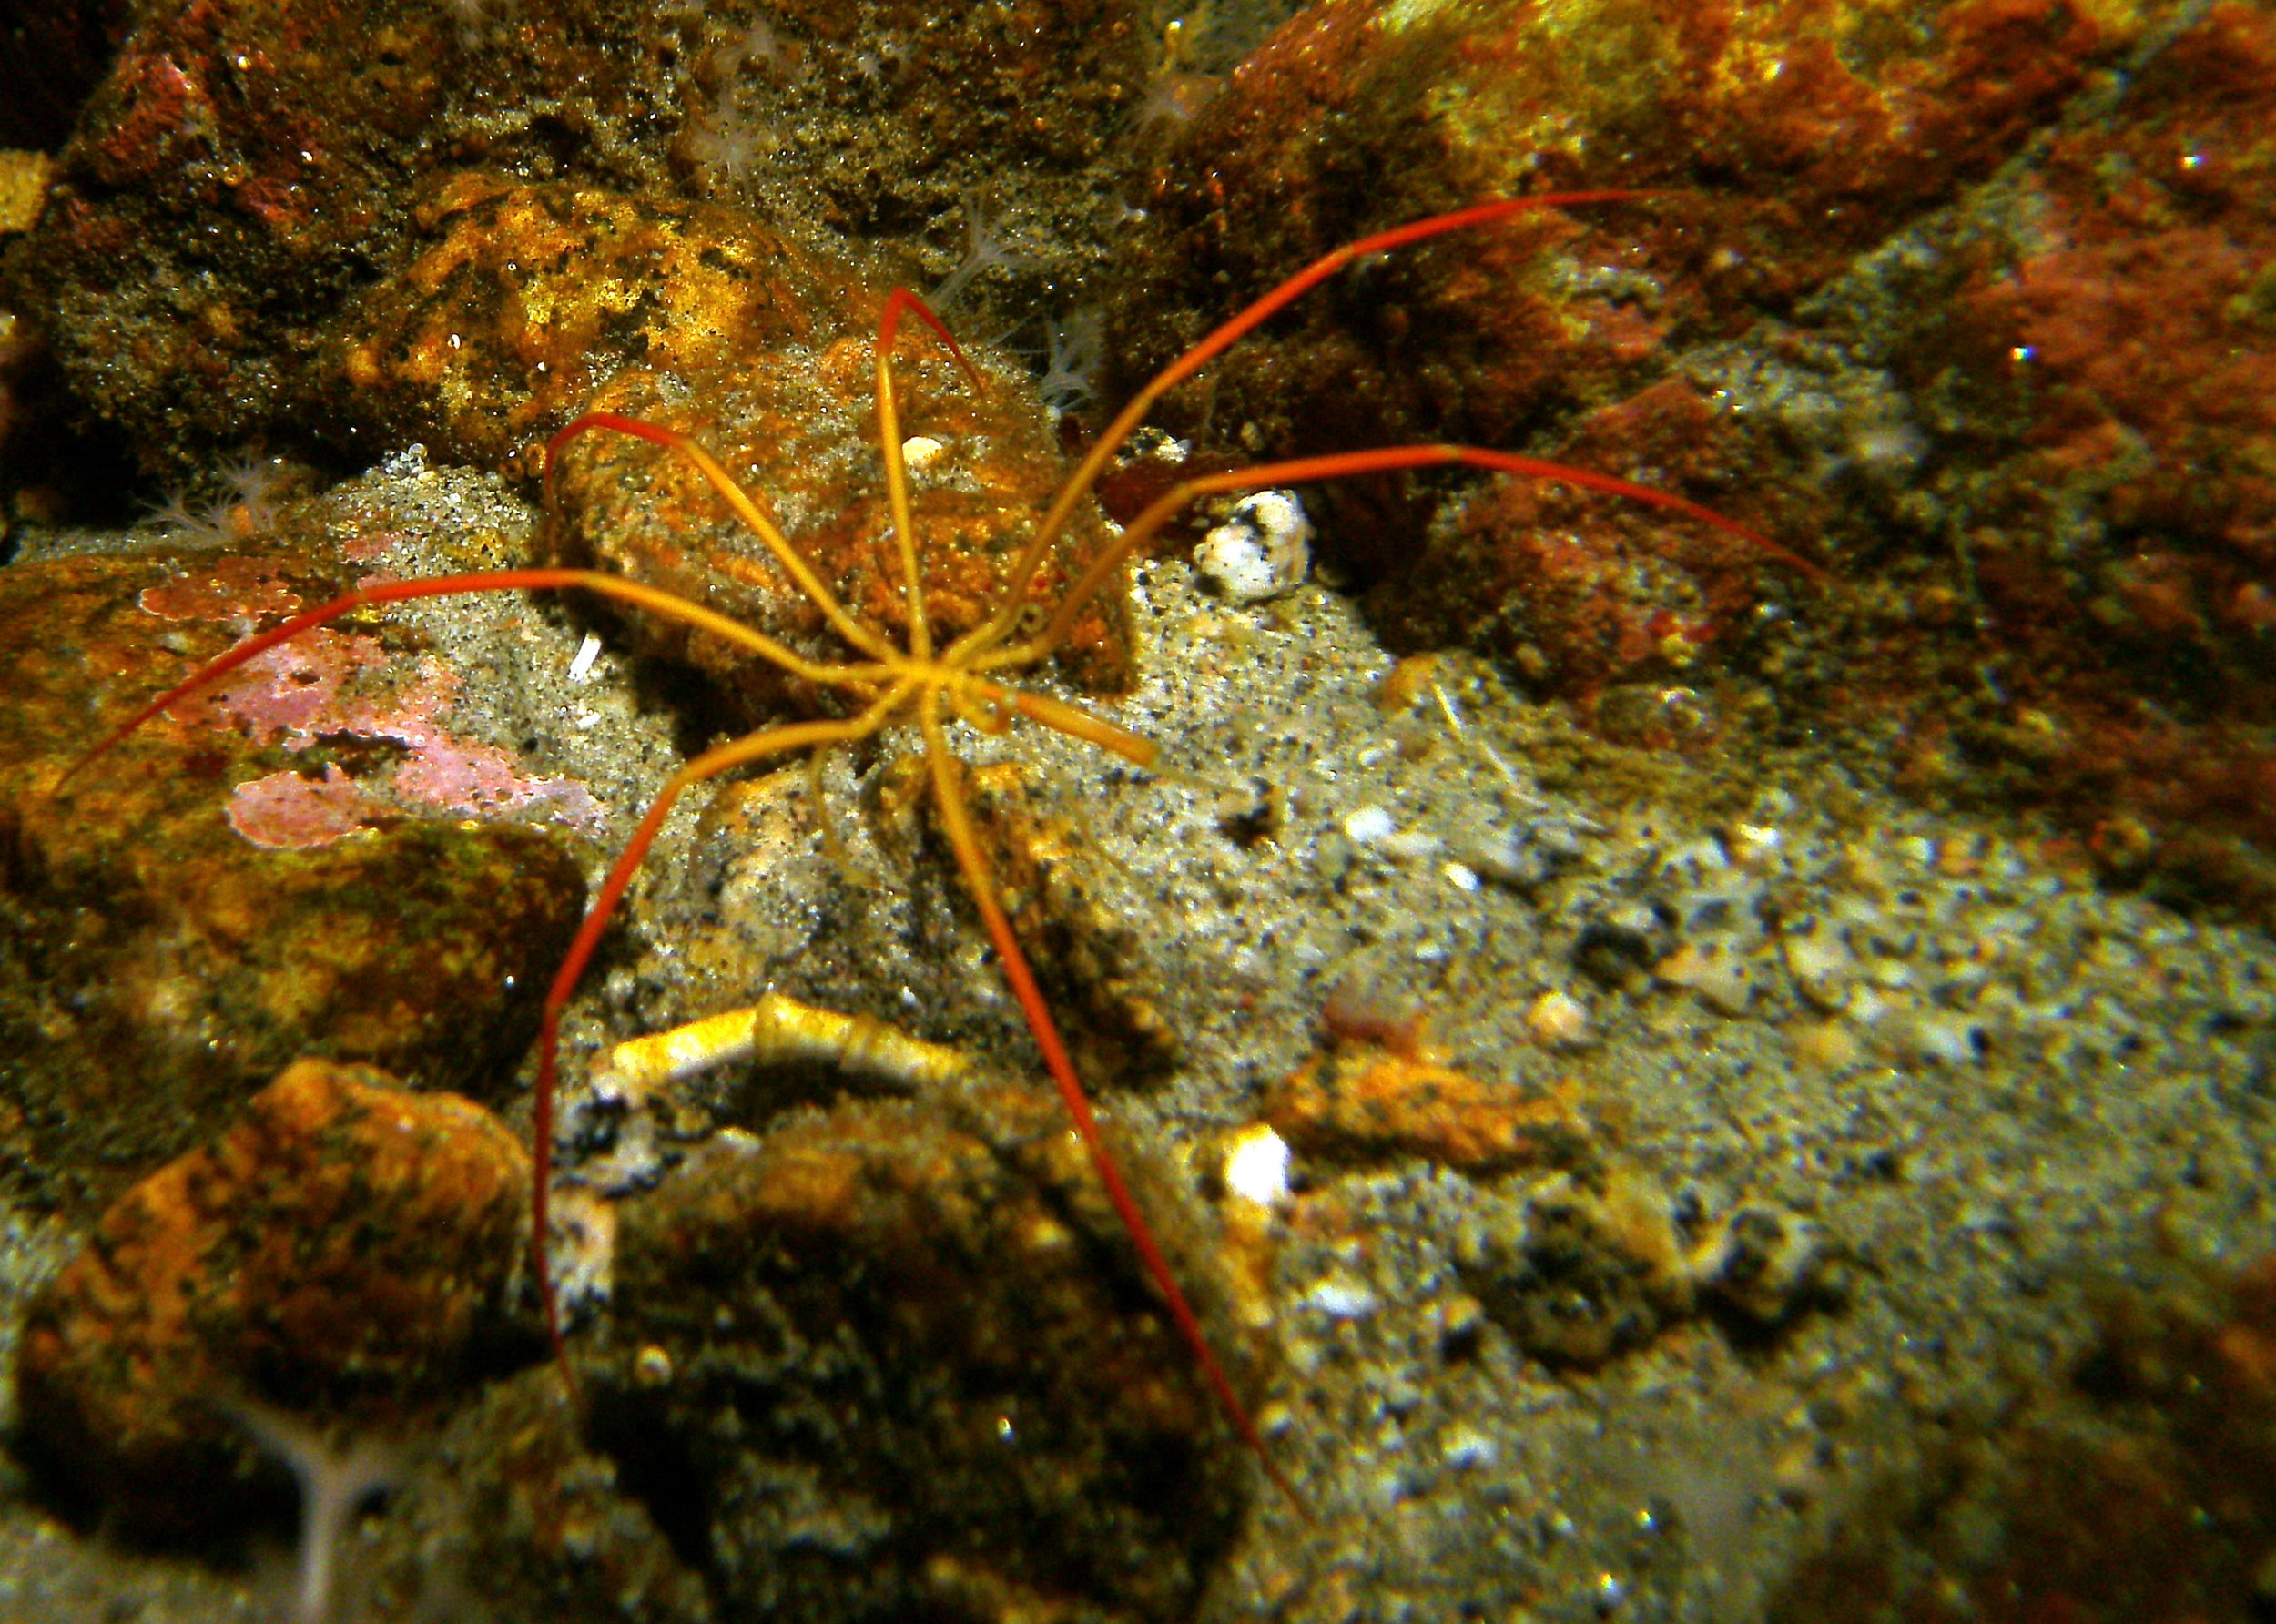 Sea_Spider_Colossendeis_megalonyx_Granite_Harbor.JPG